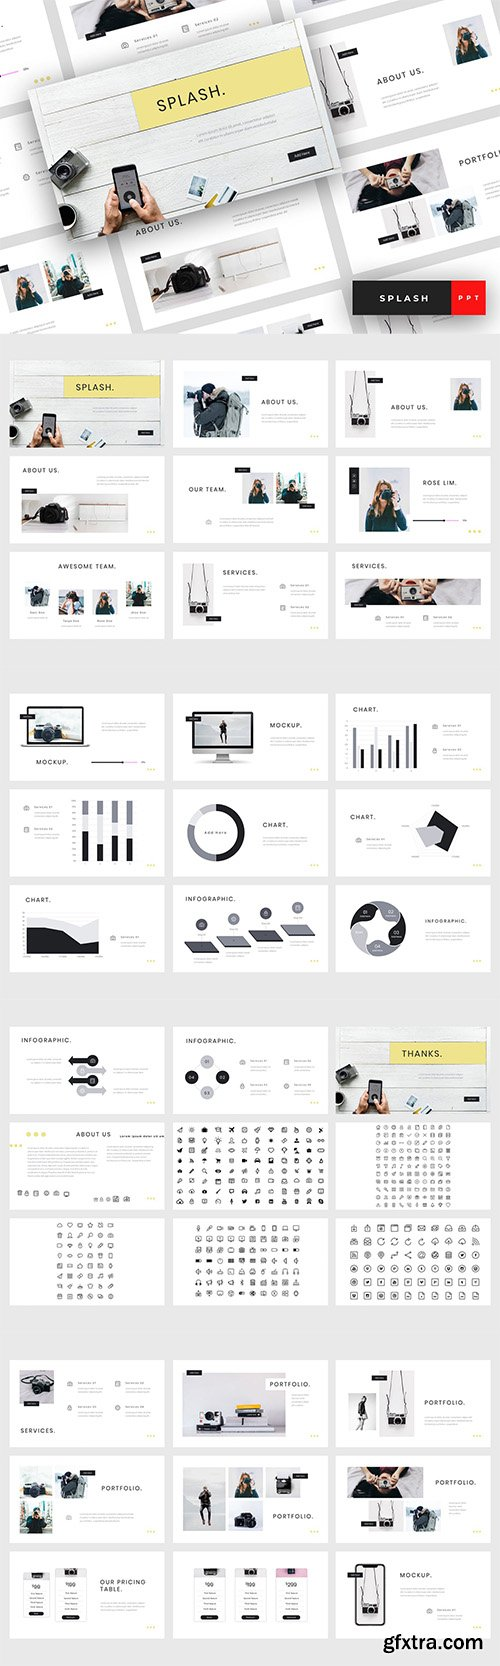 Splash - Photography Powerpoint, Keynote and Google Sliders Template